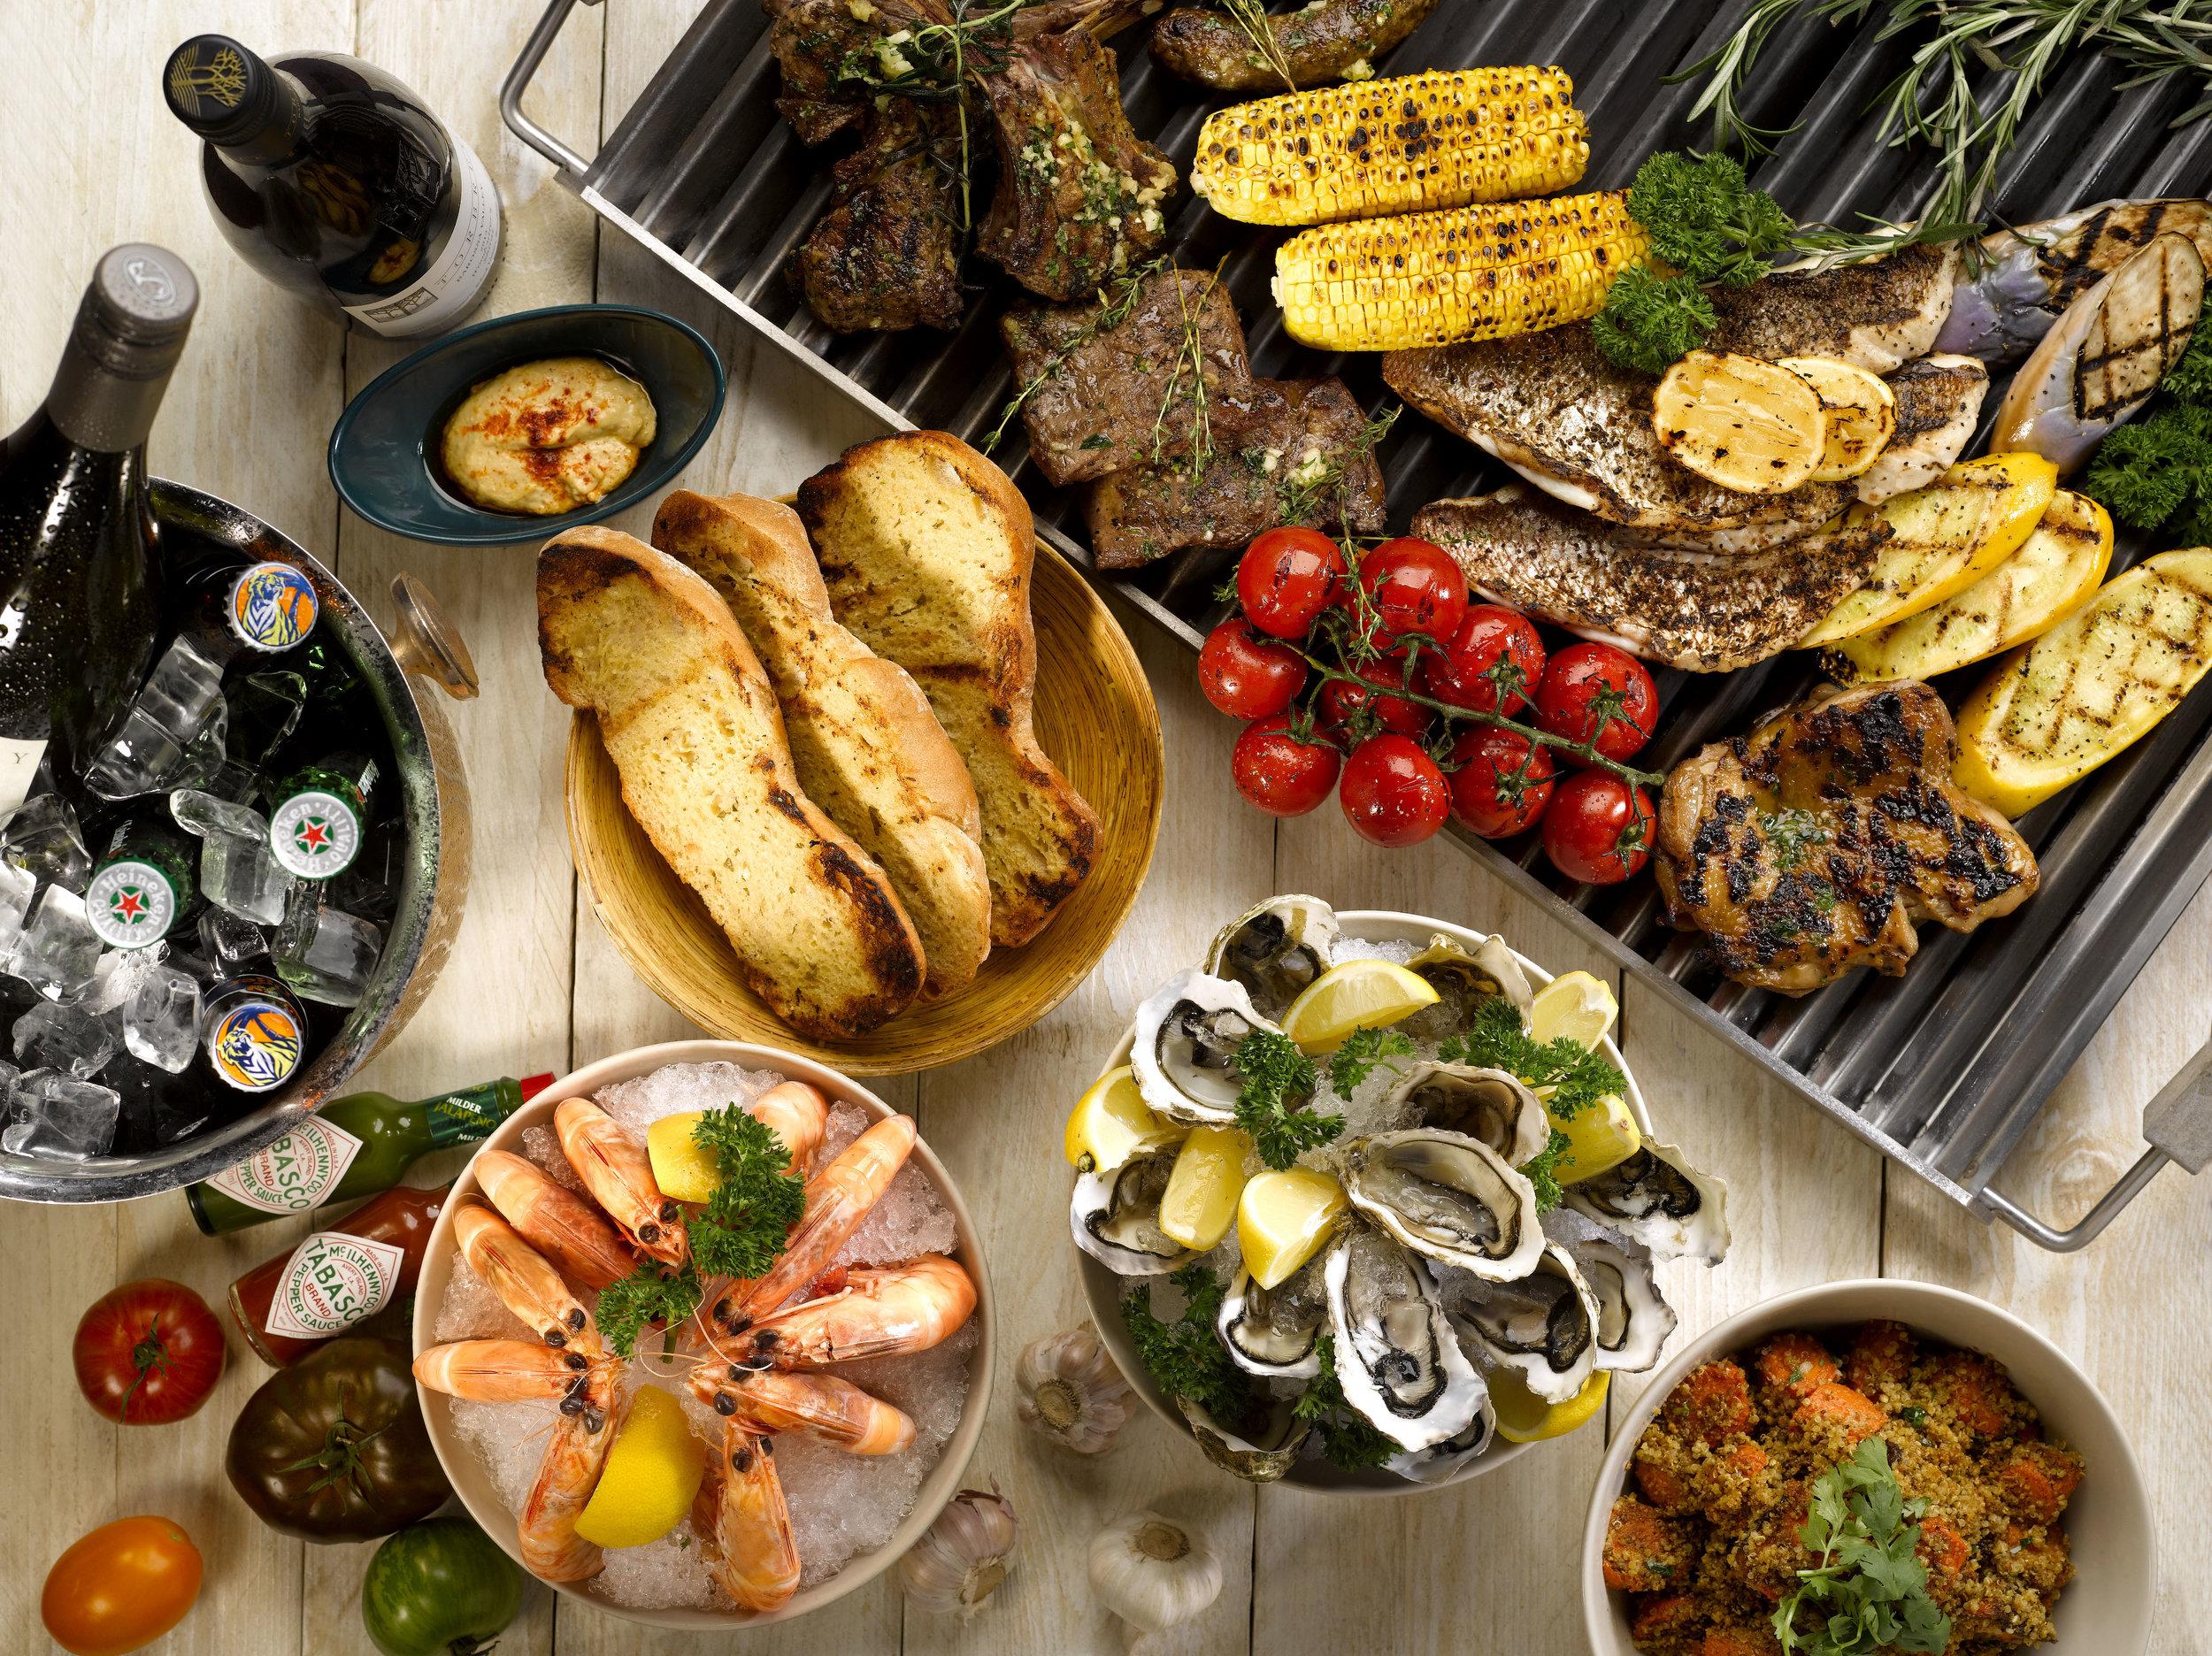 BBQ Buffet Dinner by the Pool | Photo Credit: Grand Hyatt Singapore